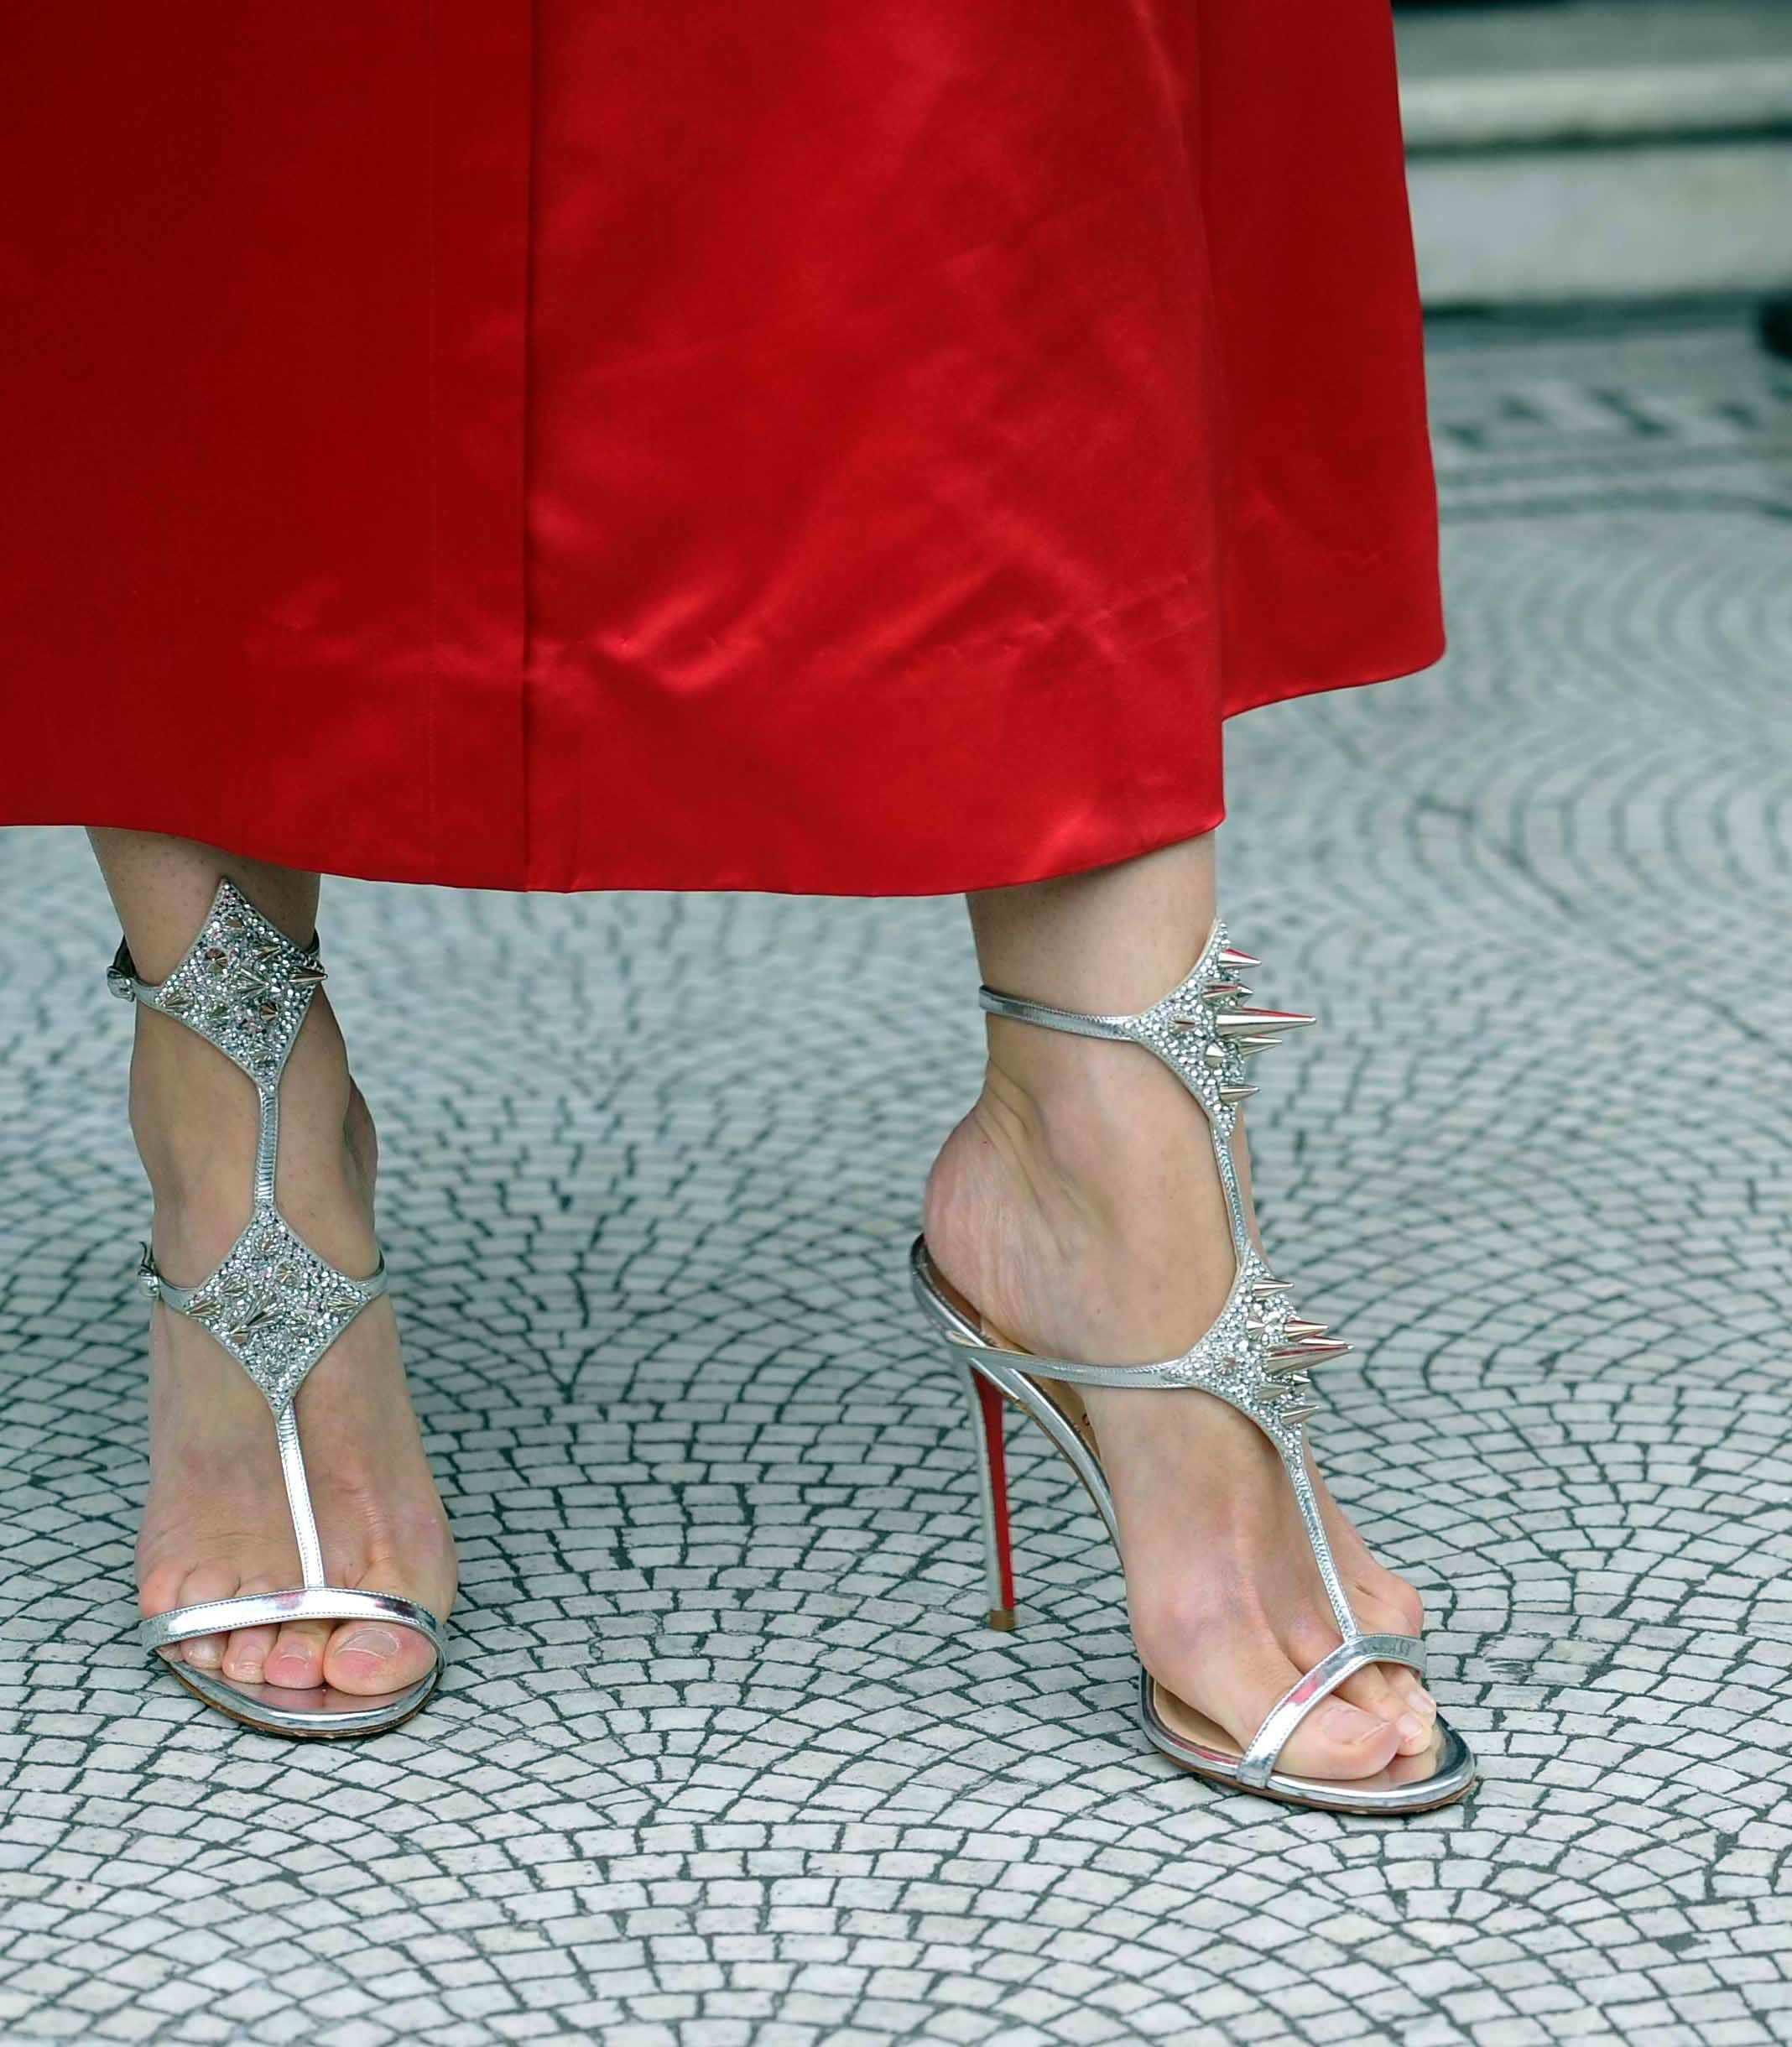 Feet Gillian Anderson nudes (97 photo), Pussy, Cleavage, Feet, underwear 2015